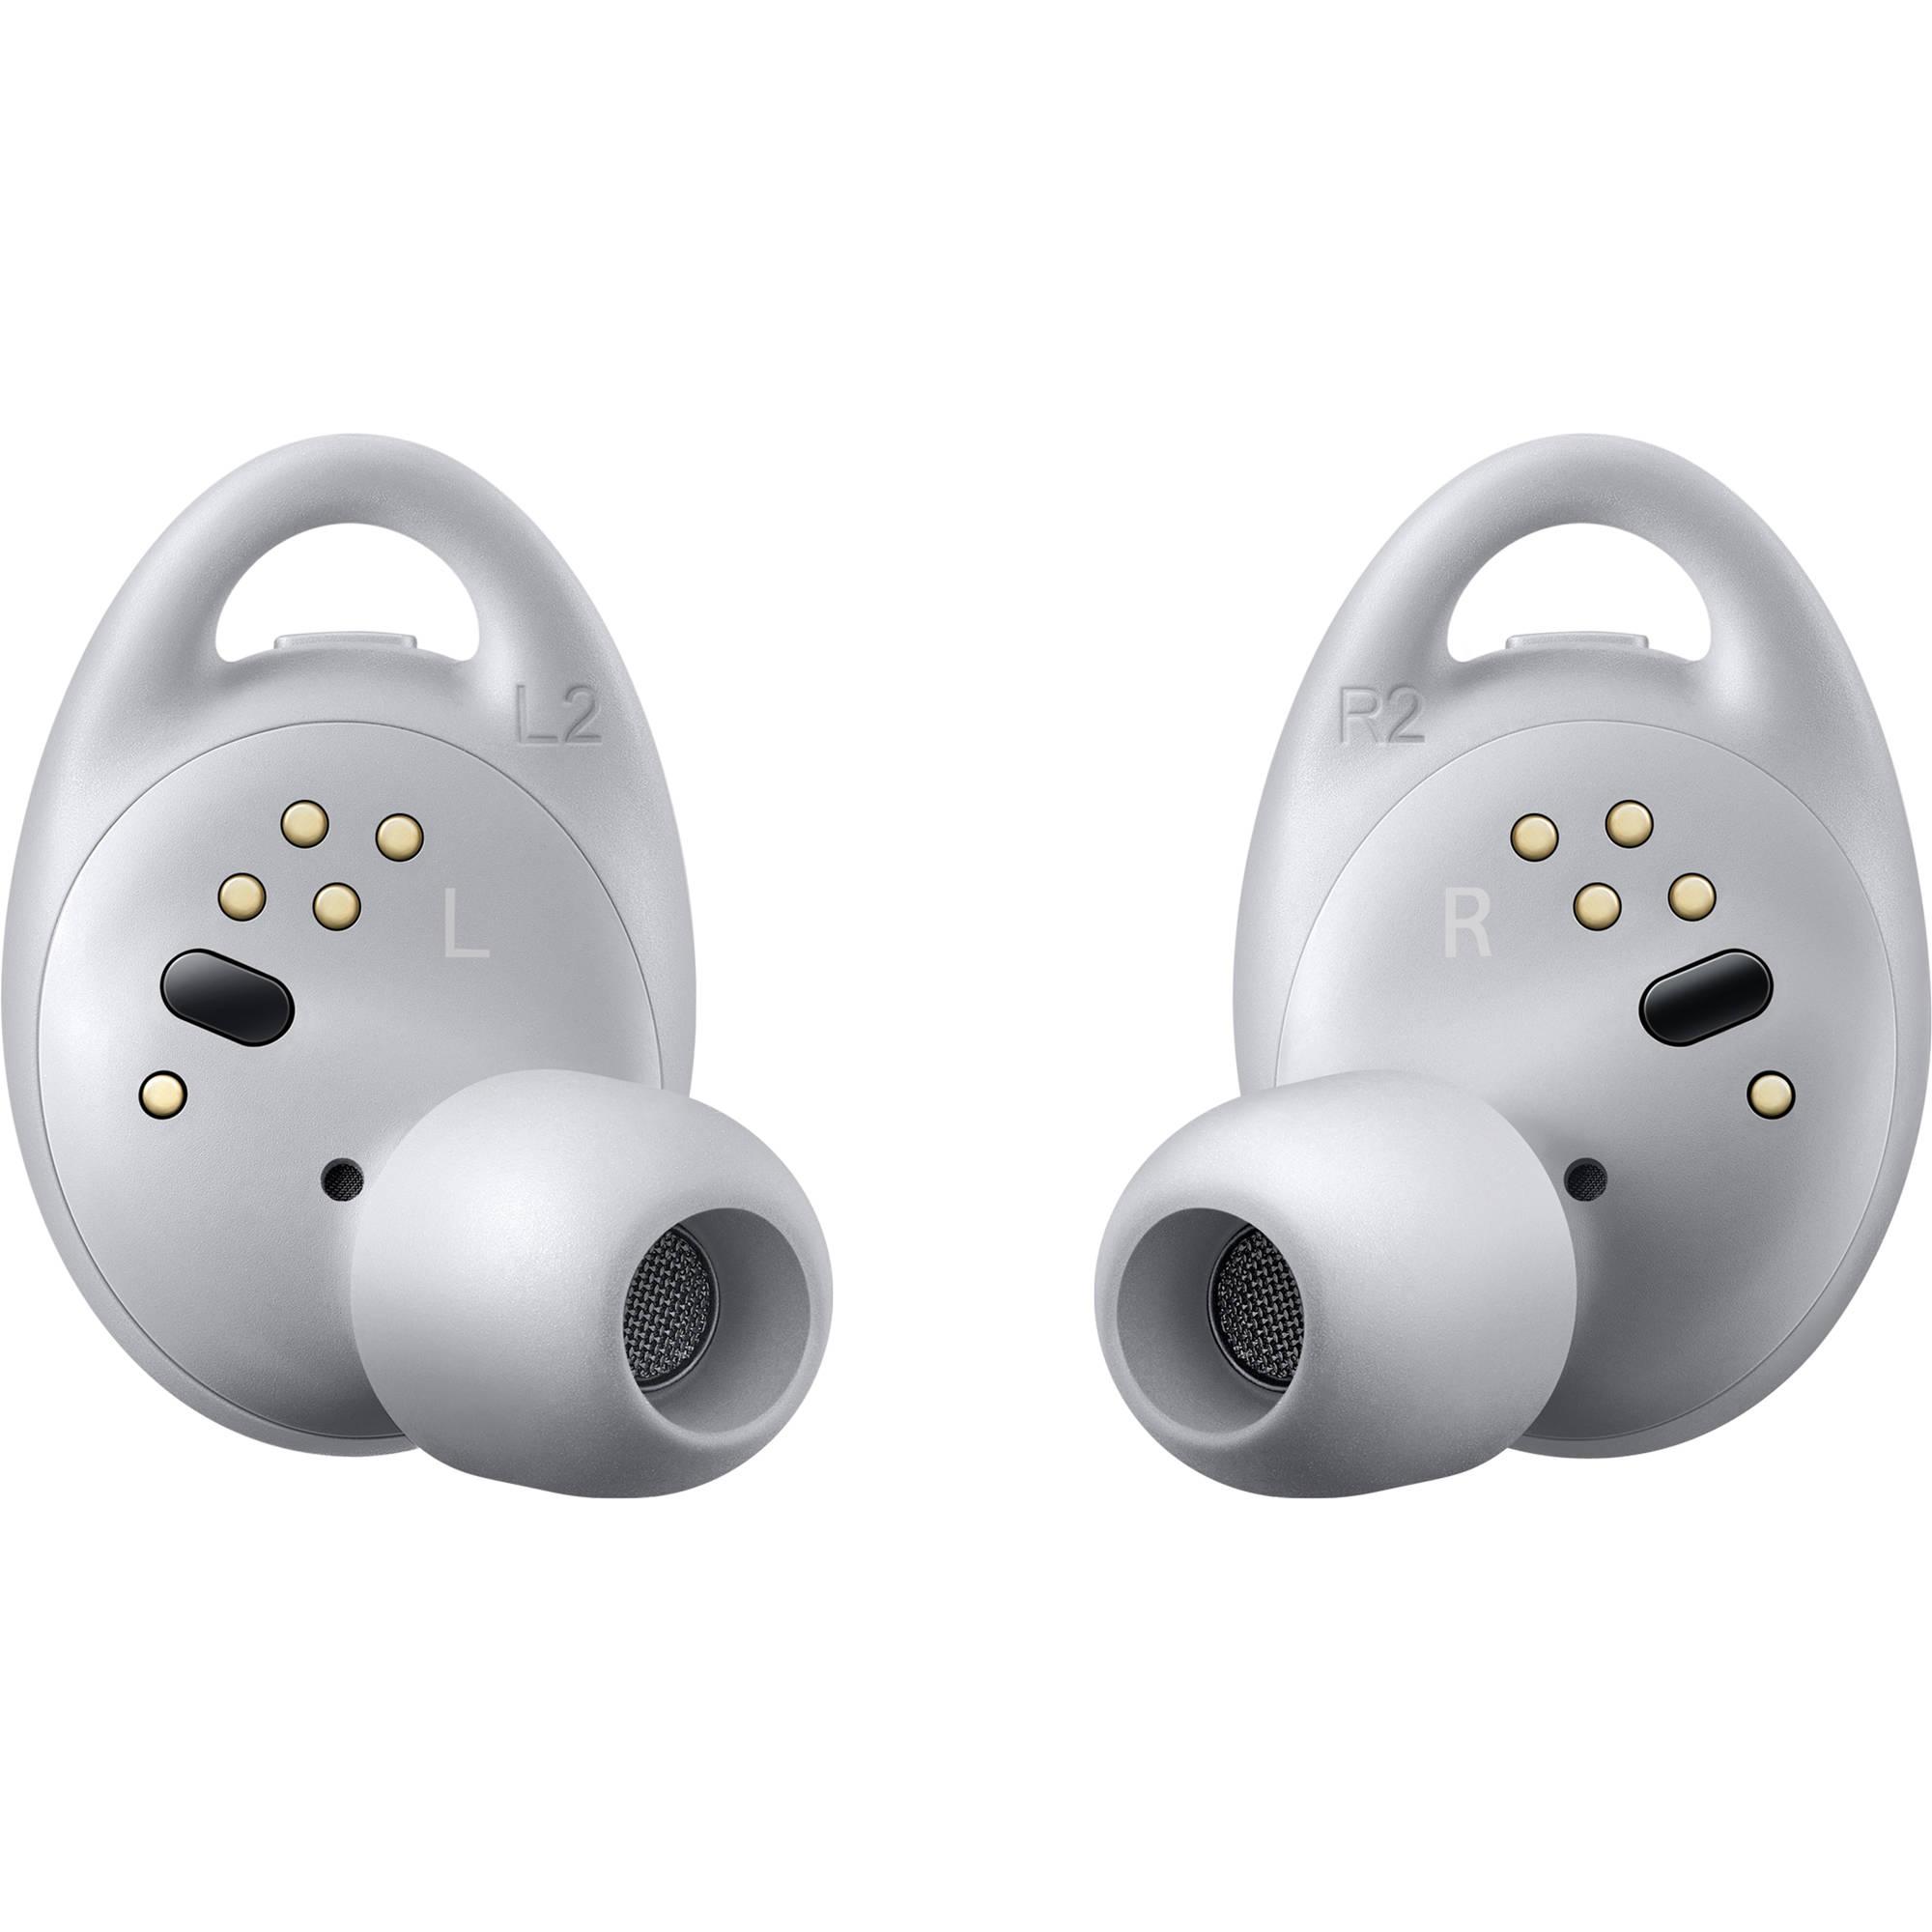 Samsung Gear Iconx Wireless Earbuds Sm R140nzwaxar B H Photo